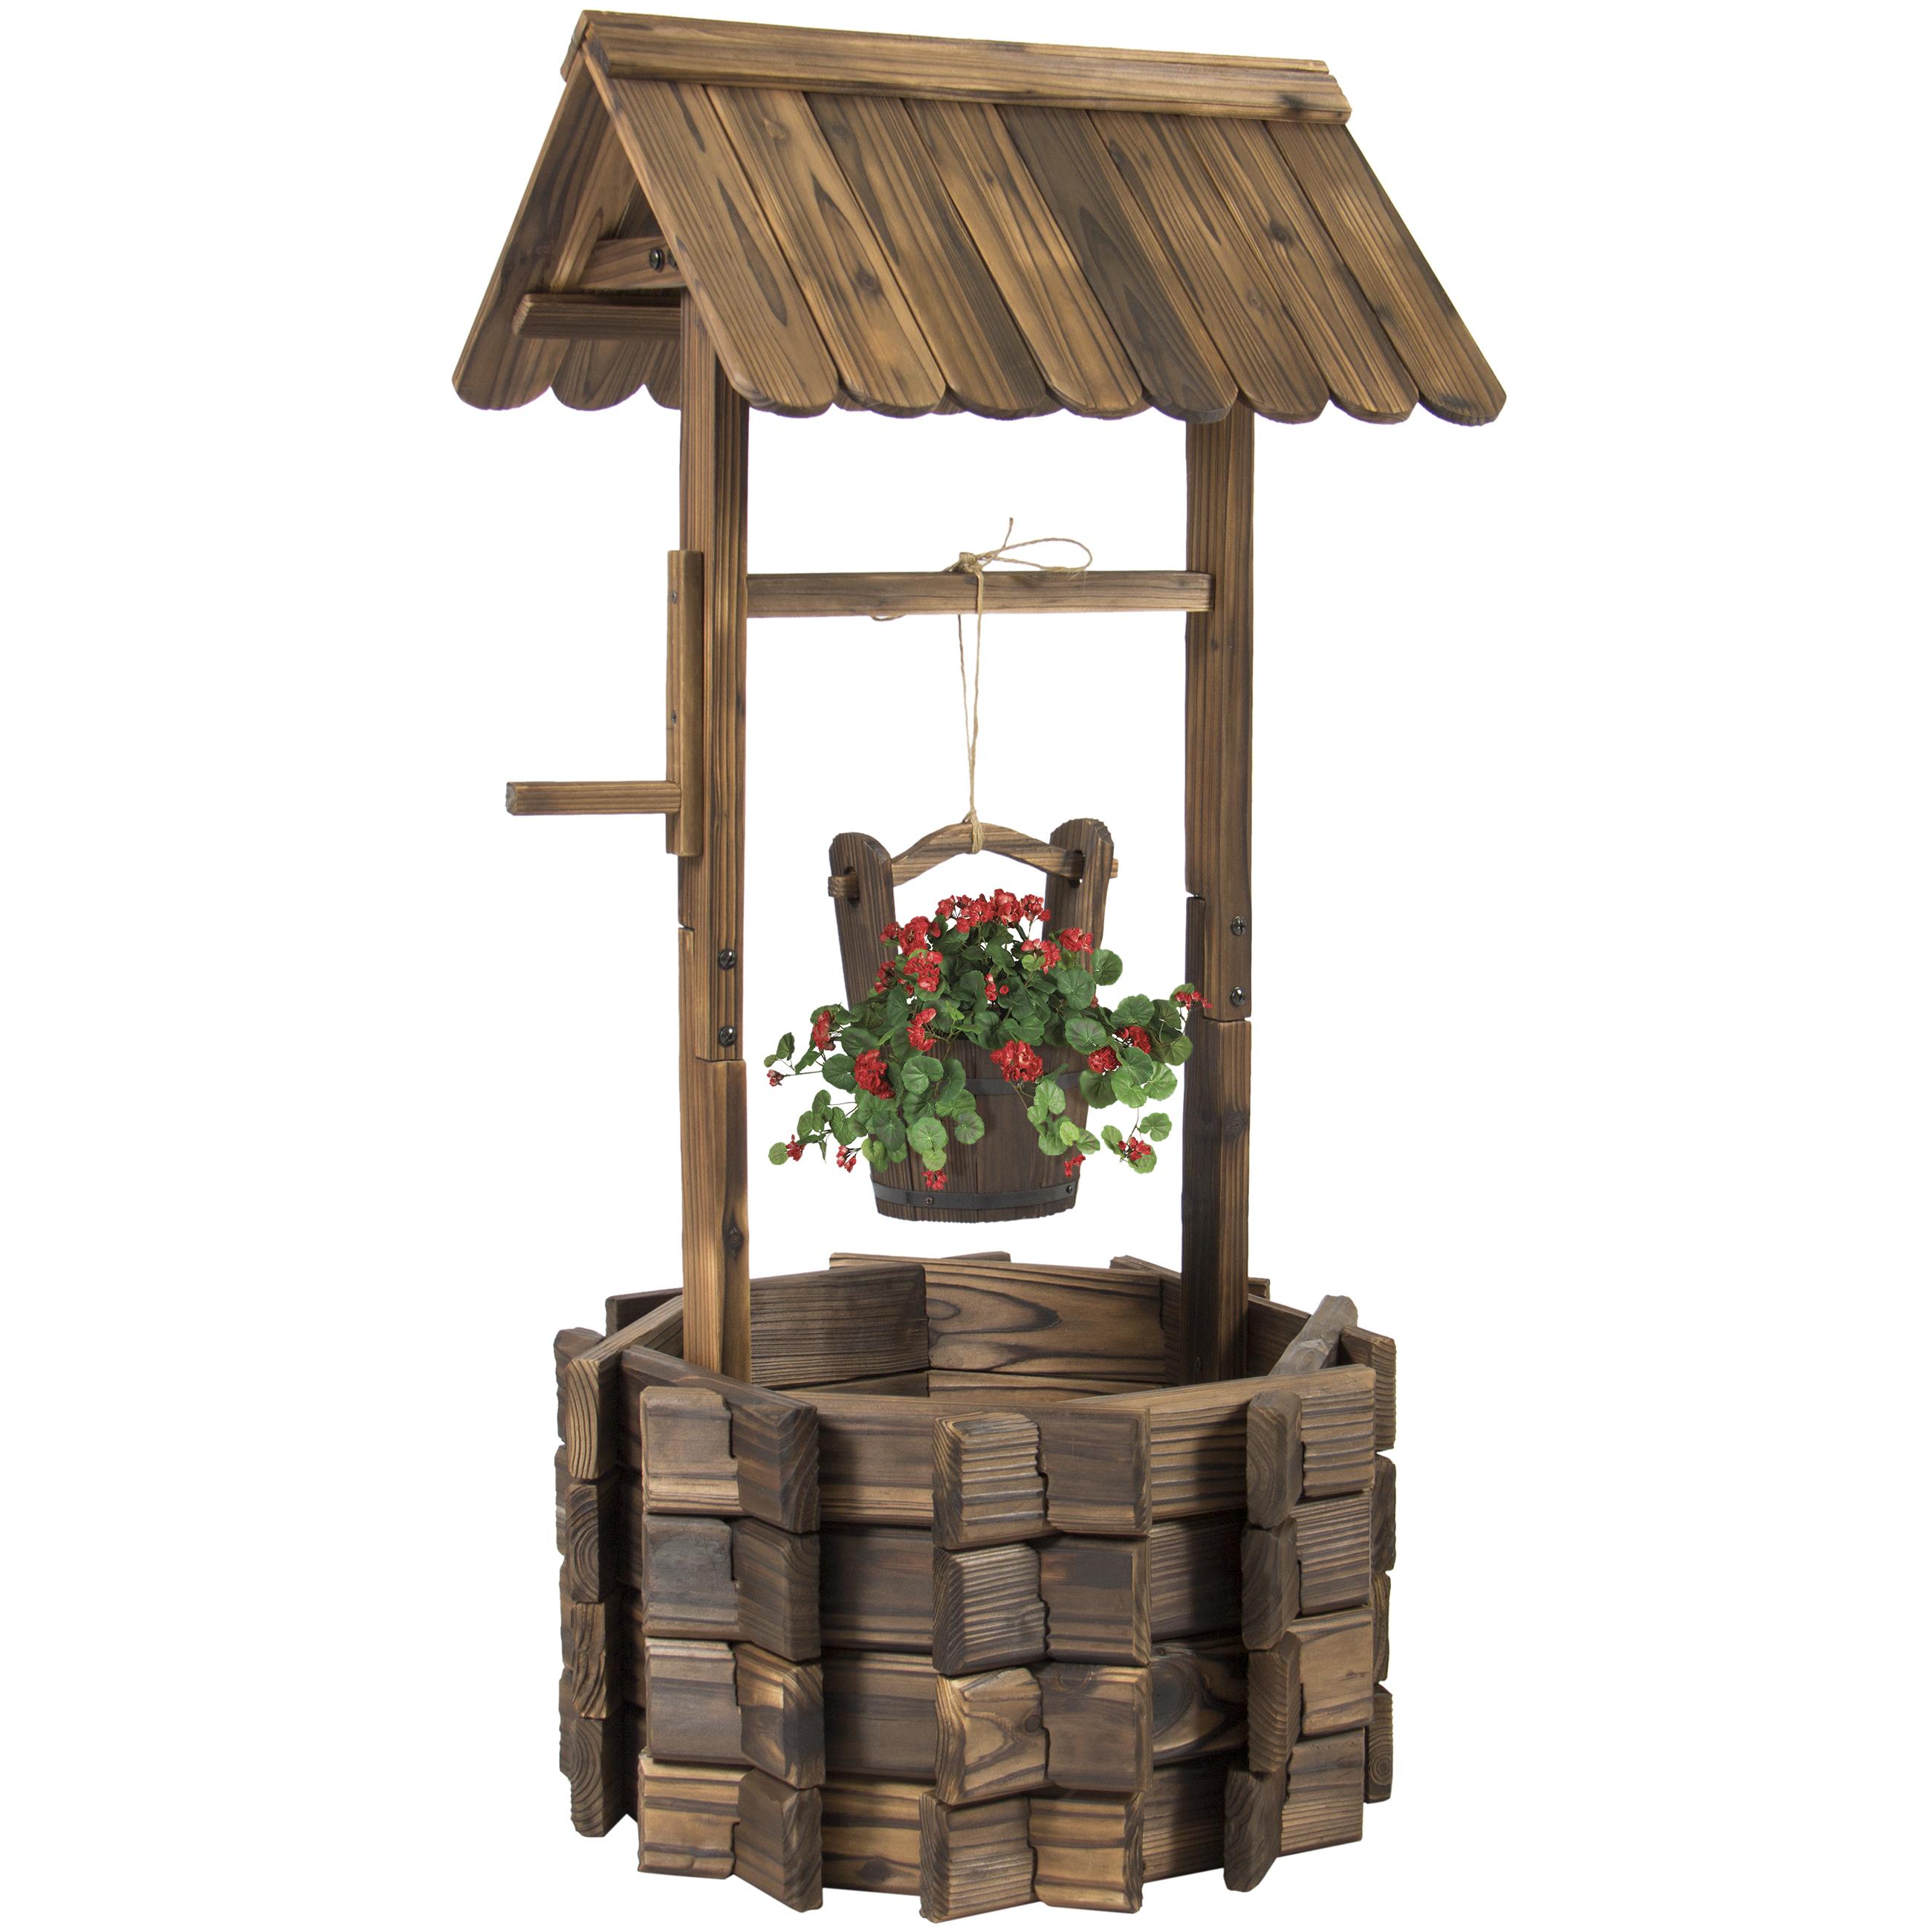 Best Choice Products Outdoor Patio Garden Wooden Flower Wishing Well Bucket Planter -Brown